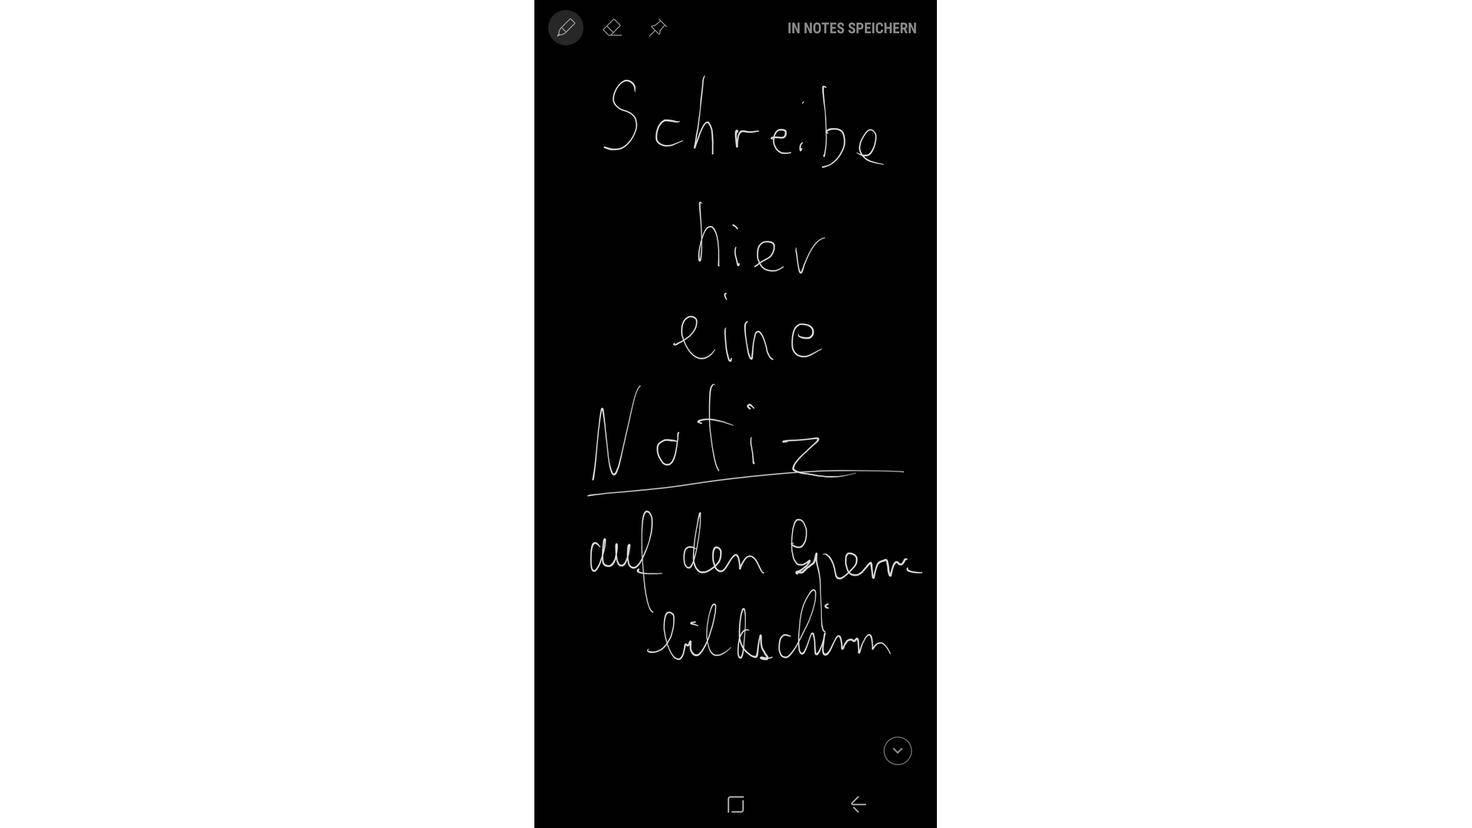 Samsung-Galaxy-Note-9-S-Pen-Screen-Off-Memo